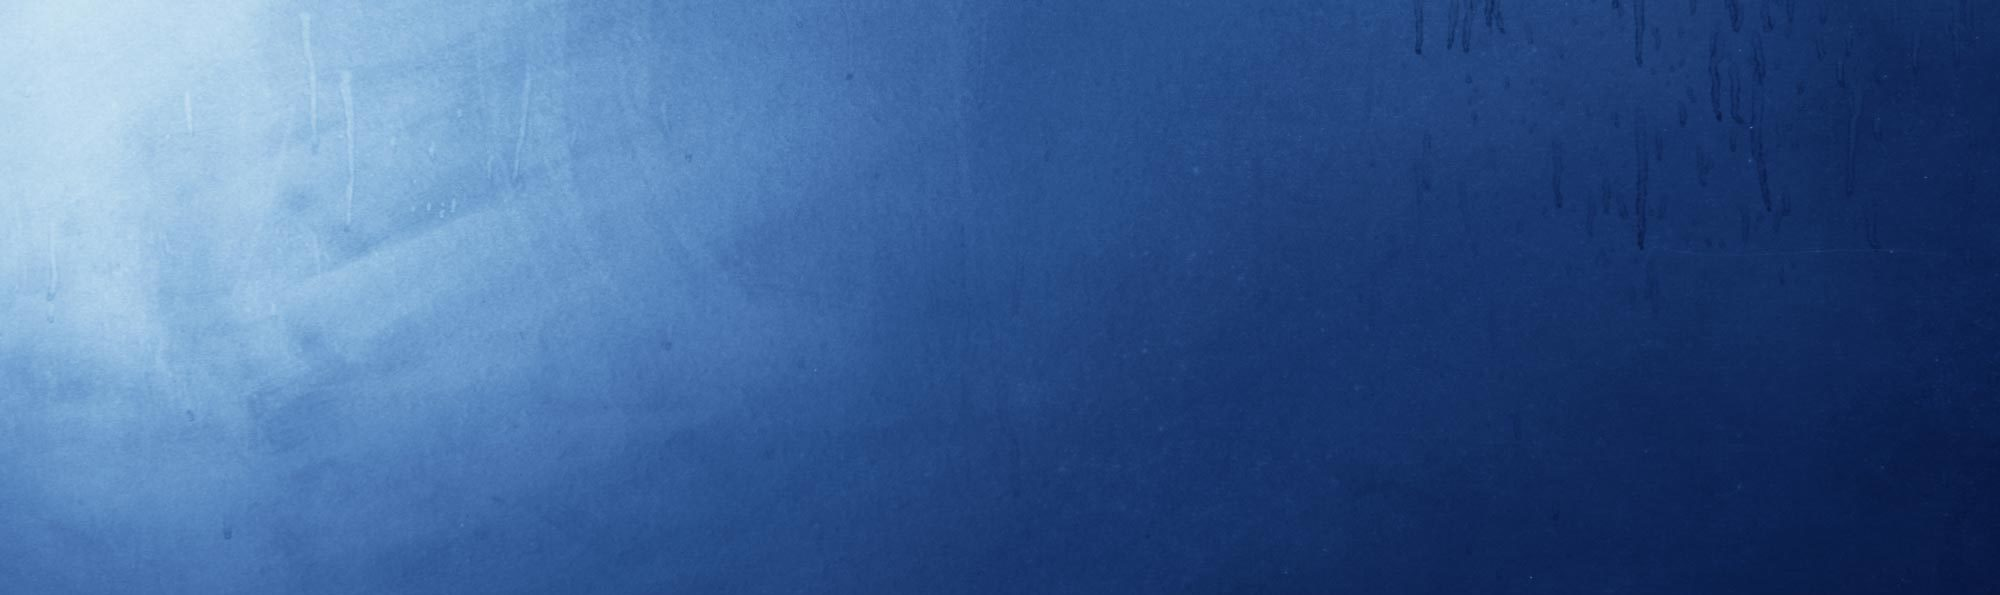 Decorate blue photo